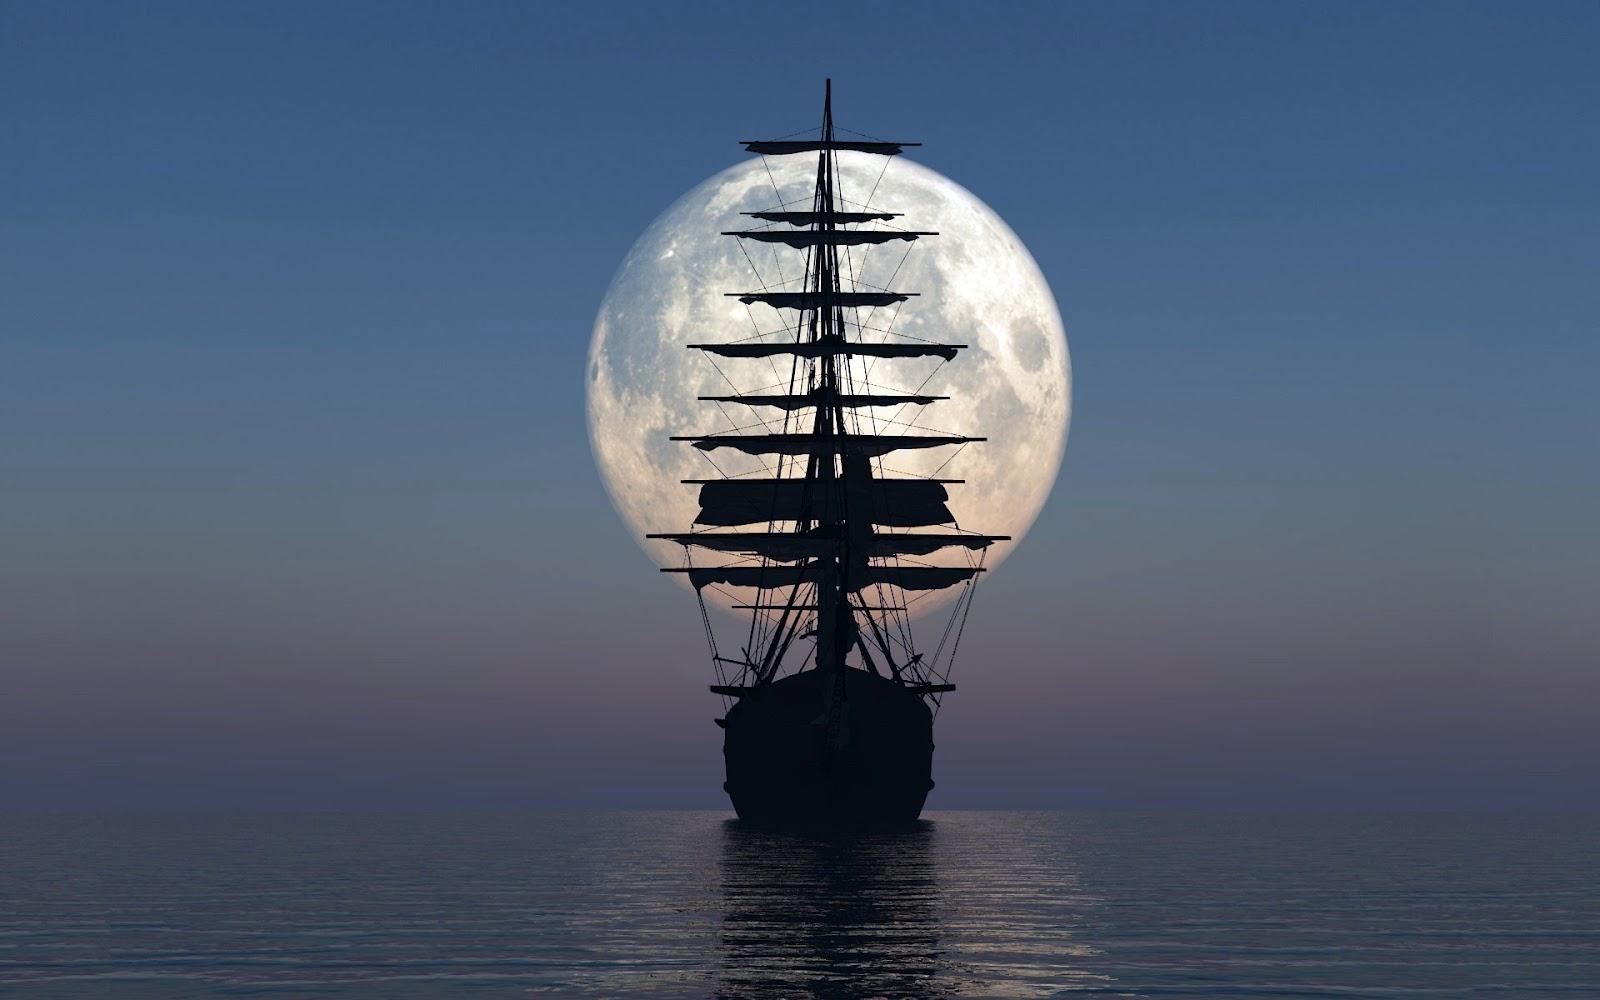 http://2.bp.blogspot.com/-fUOzEnCwM34/UEE0VsF8A5I/AAAAAAAAjkk/_gRZo1RmsgY/s1600/Barco-y-Luna-desde-el-Oceano_Fondos-HD-de-Barcos-y-Lunas.jpg